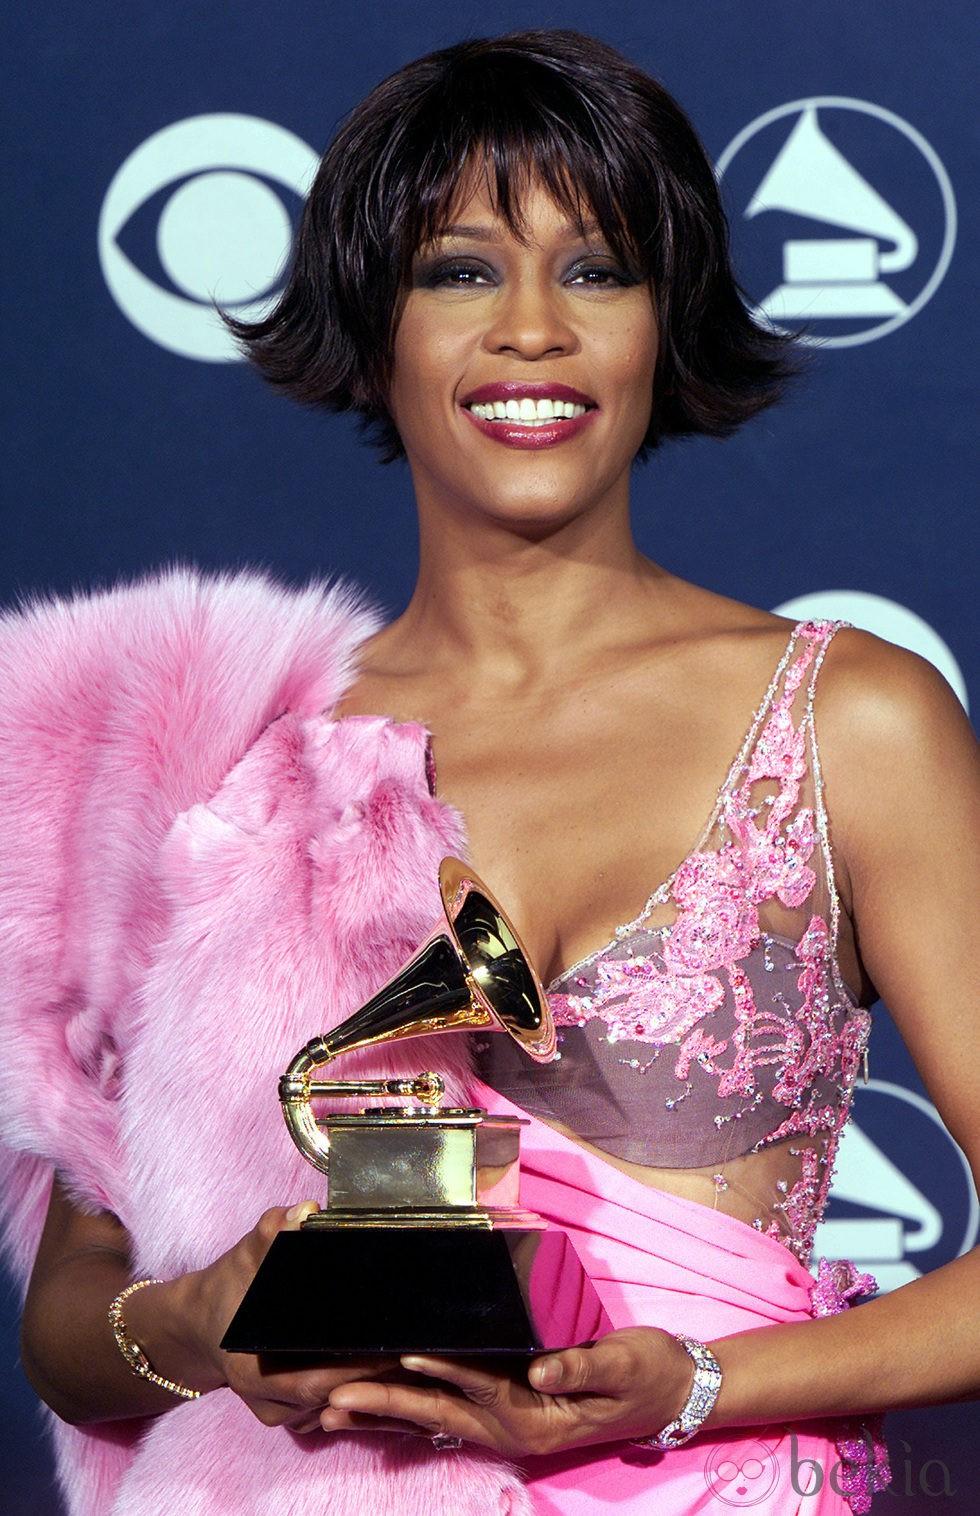 Whitney Houston ha ganado seis Grammys en toda su carrera